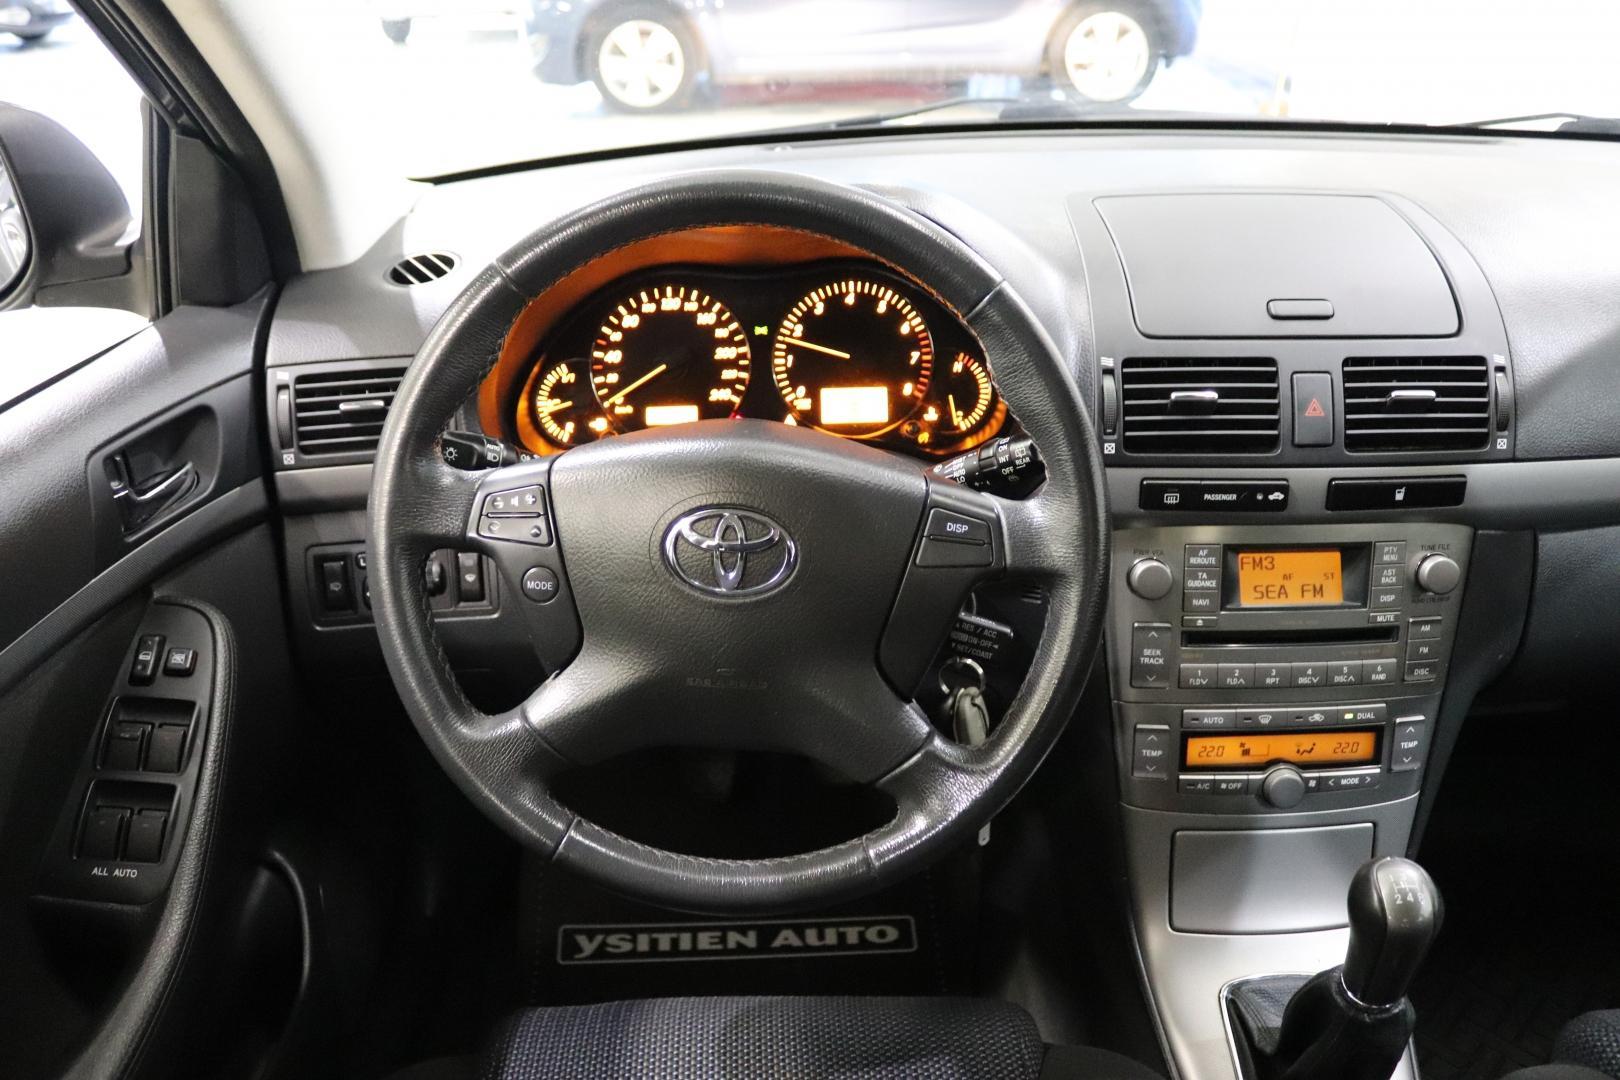 Toyota Avensis, 1.8 VVT-i Linea Sol Technical Wagon